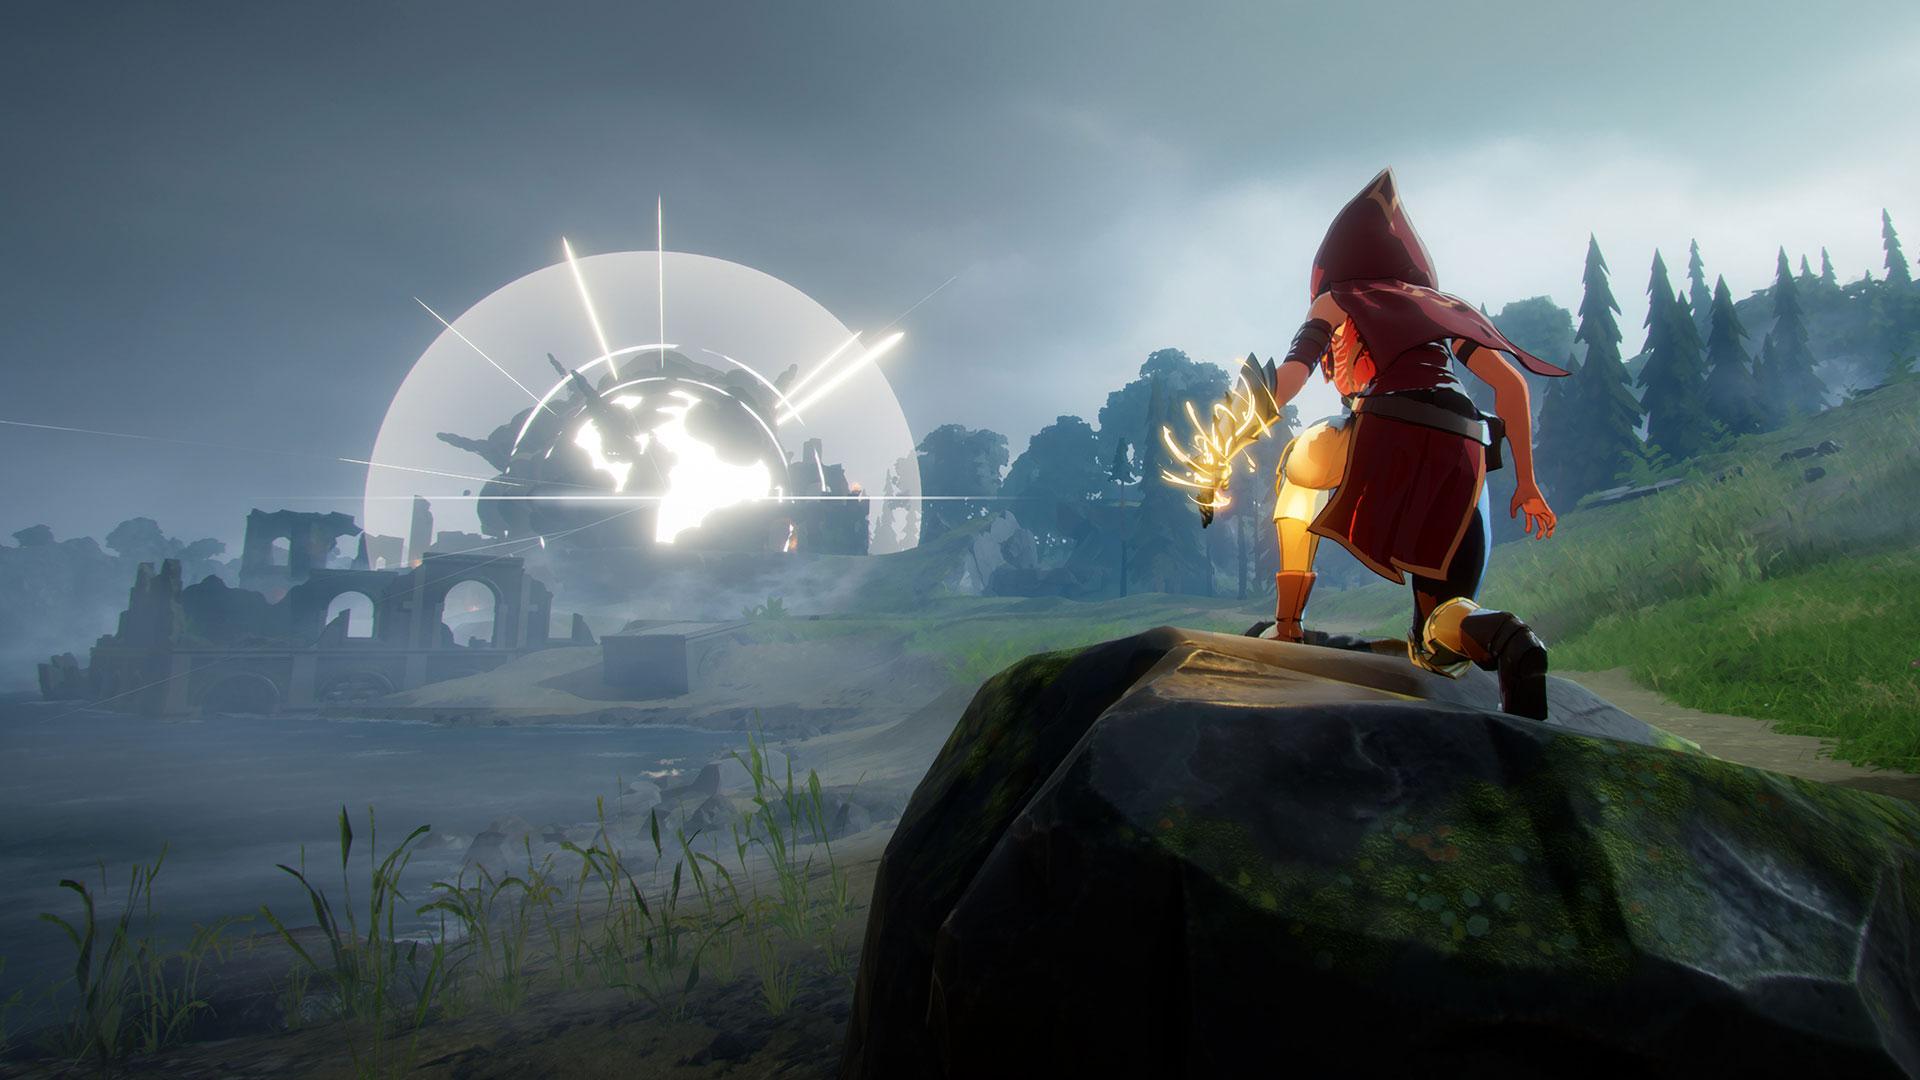 Spellbreak เกมใหม่แนว Battle Royale ภาพการ์ตูนสุดอลังการ - GameMonday